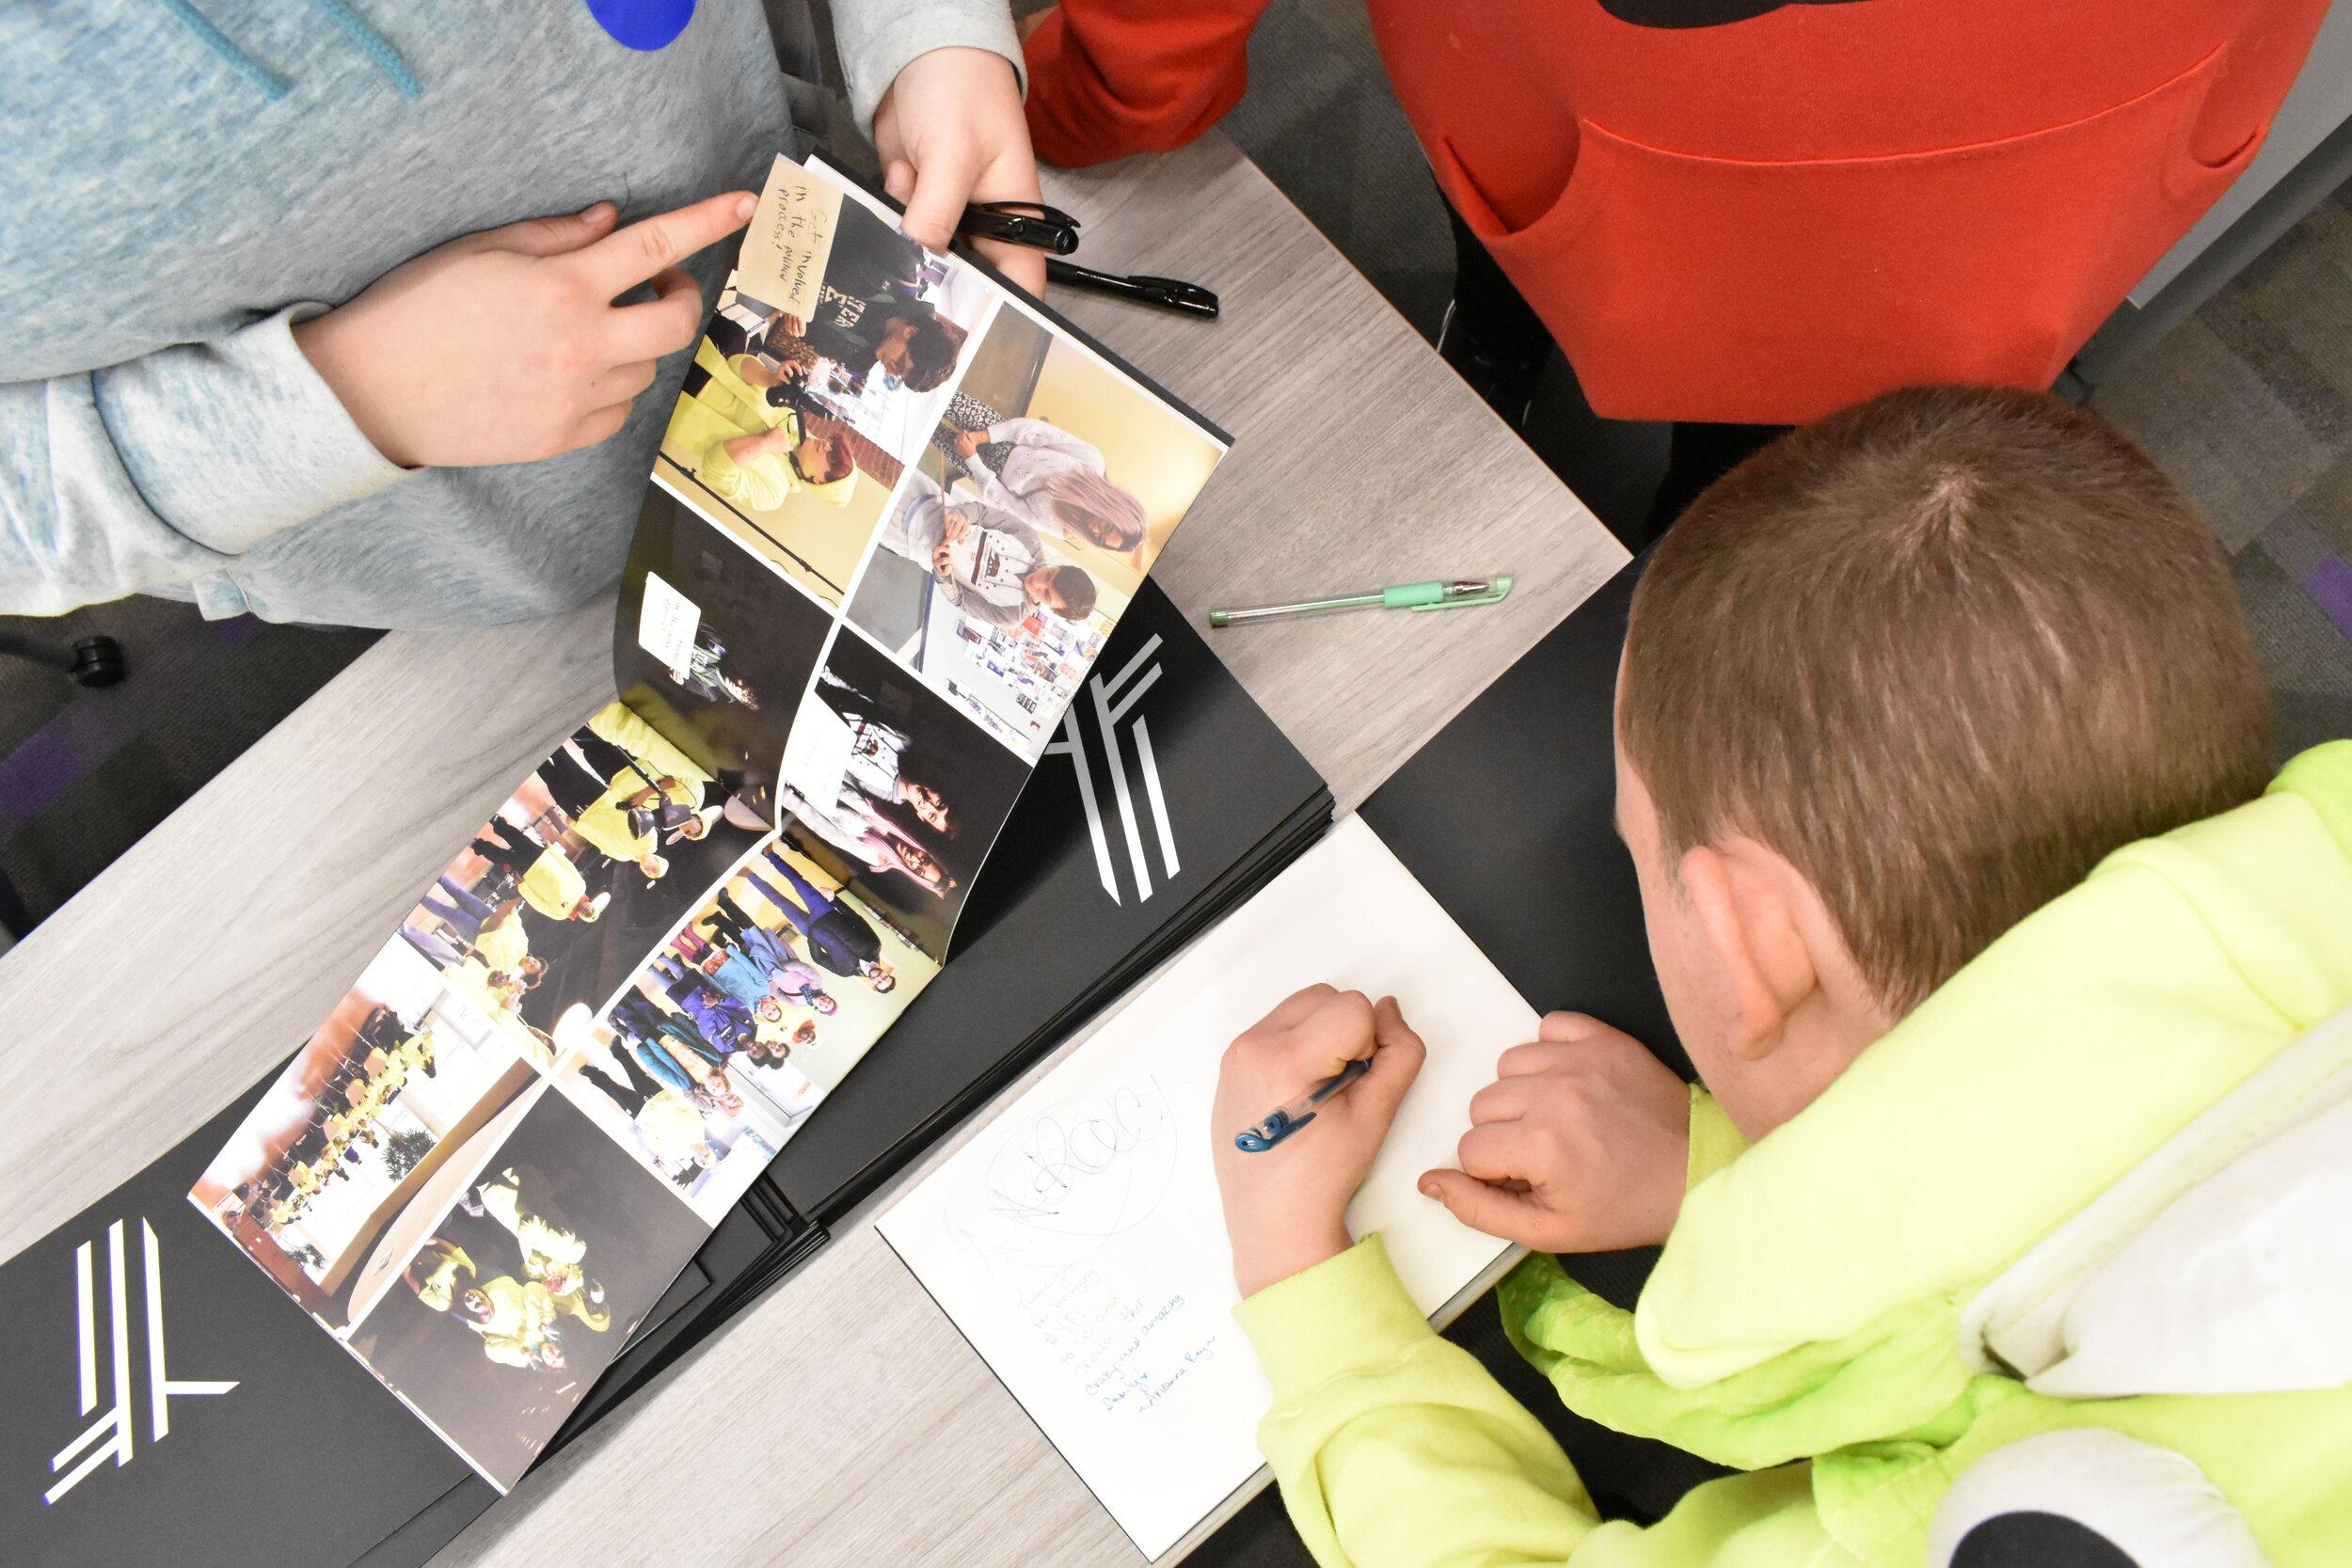 YFi autographs